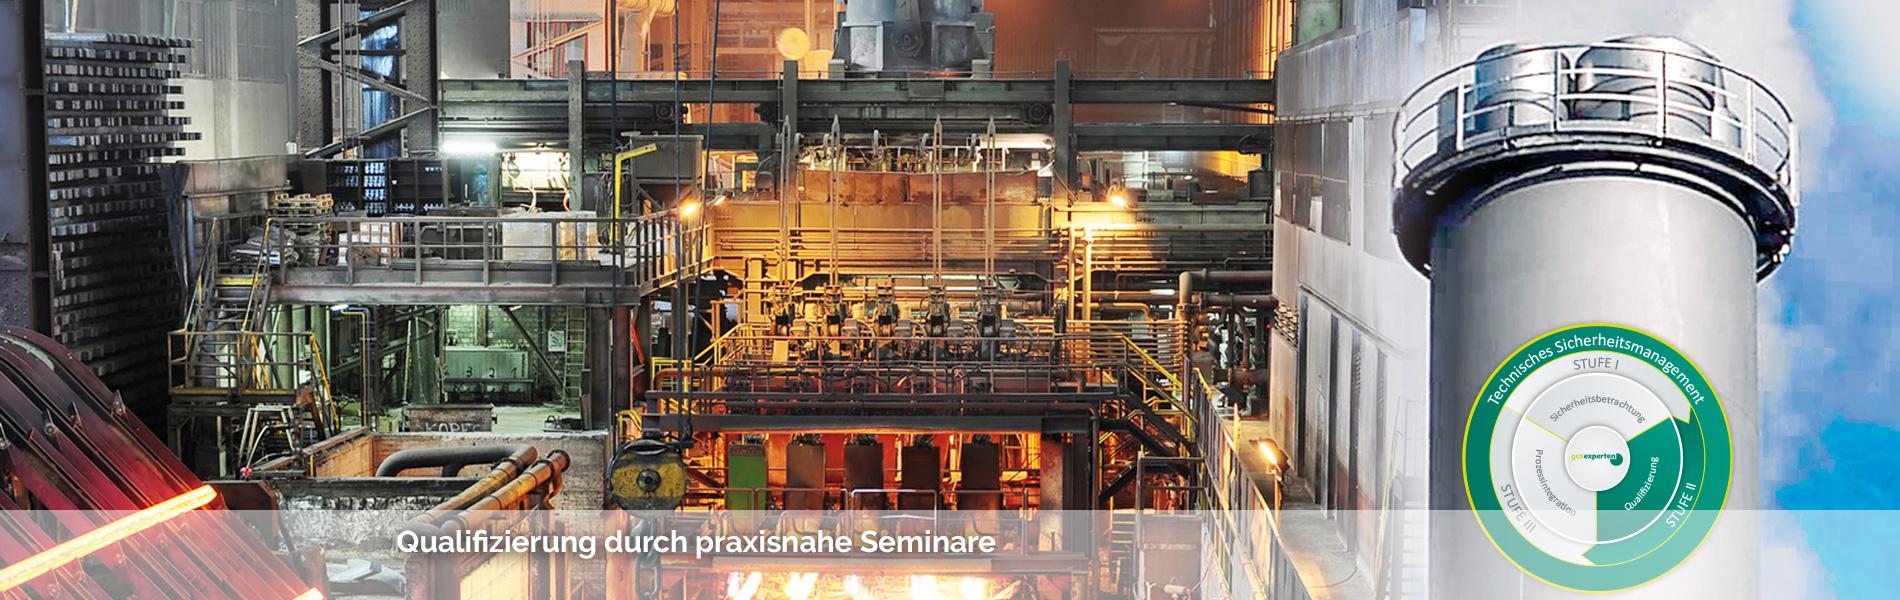 Seminare gasexperten